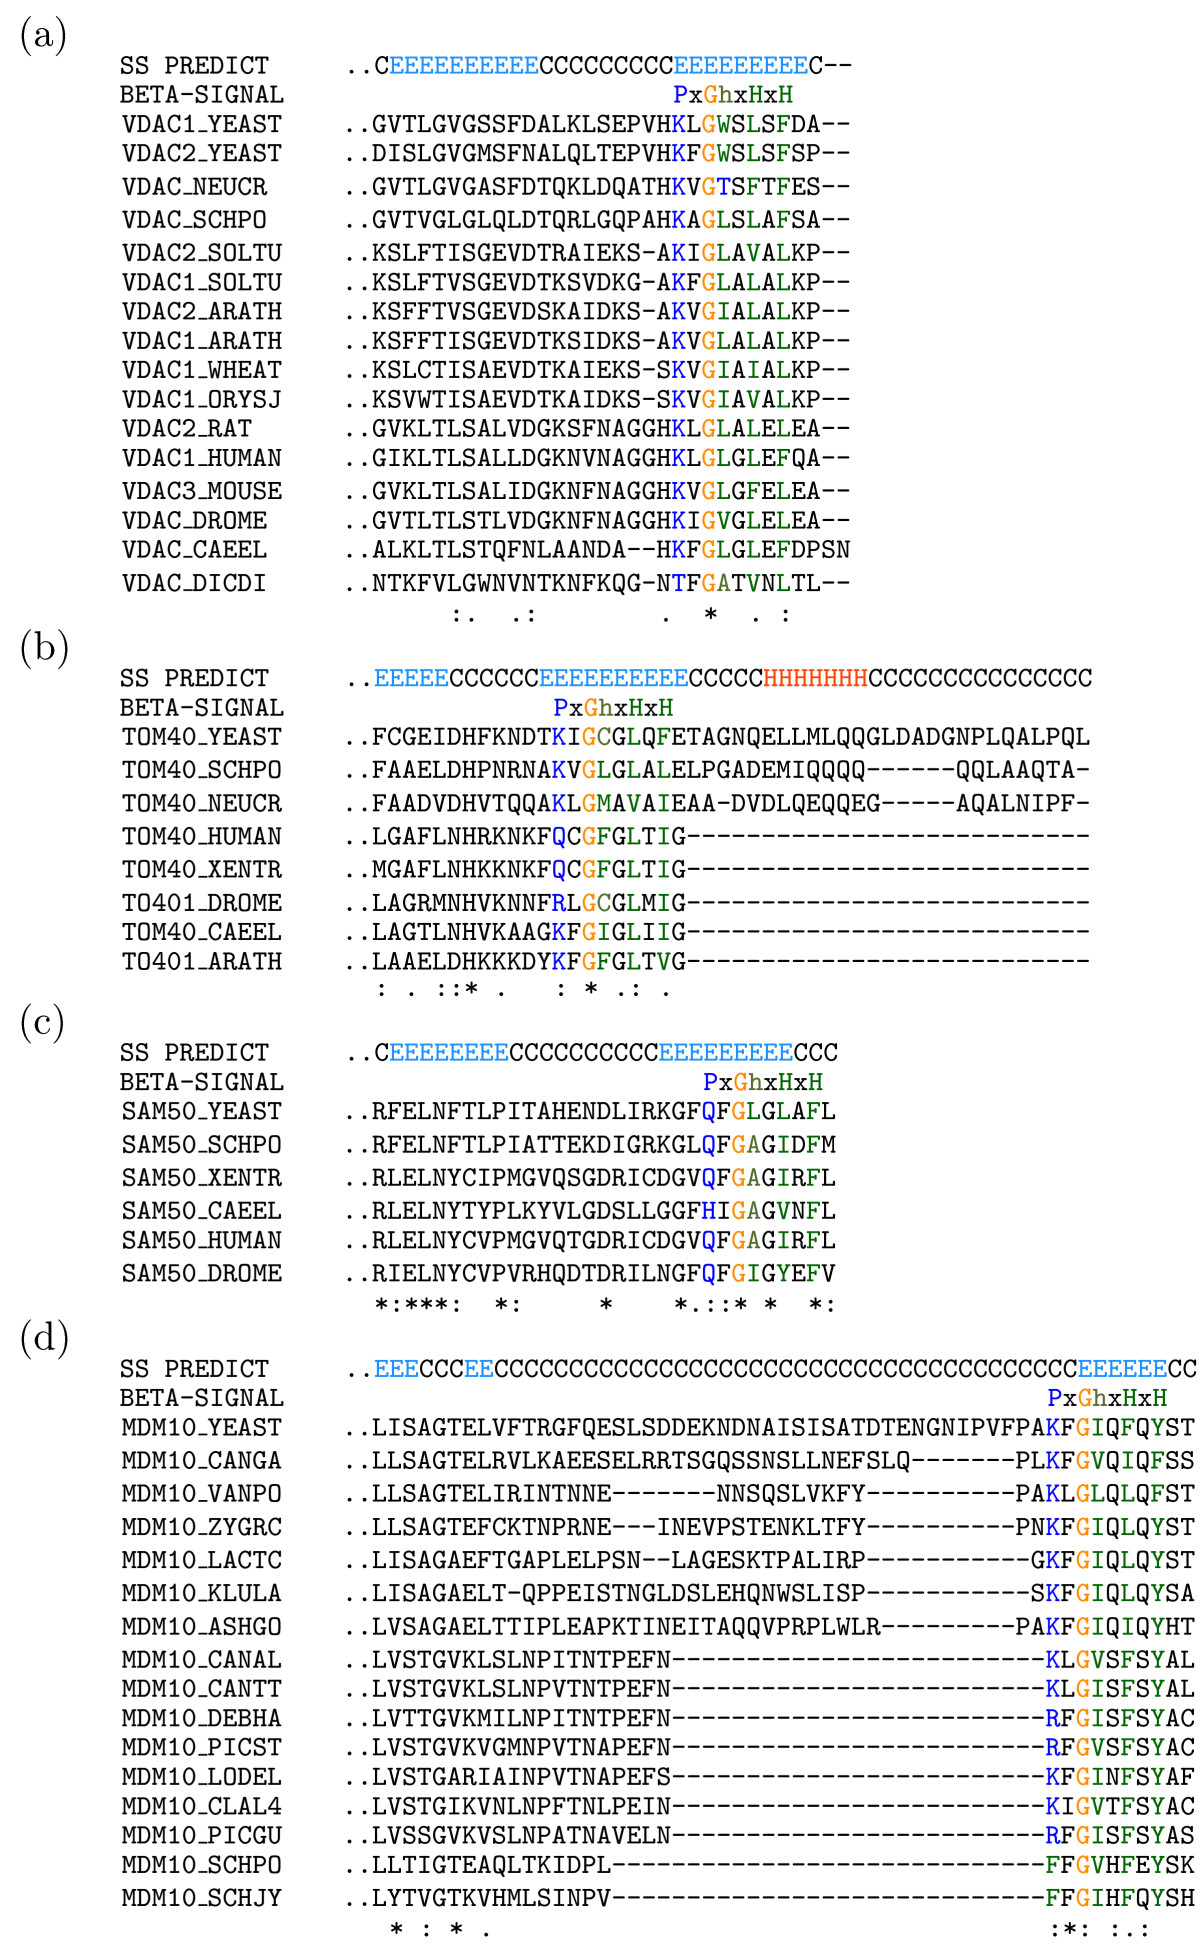 https://static-content.springer.com/image/art%3A10.1186%2F1471-2164-12-79/MediaObjects/12864_2010_3231_Fig2_HTML.jpg